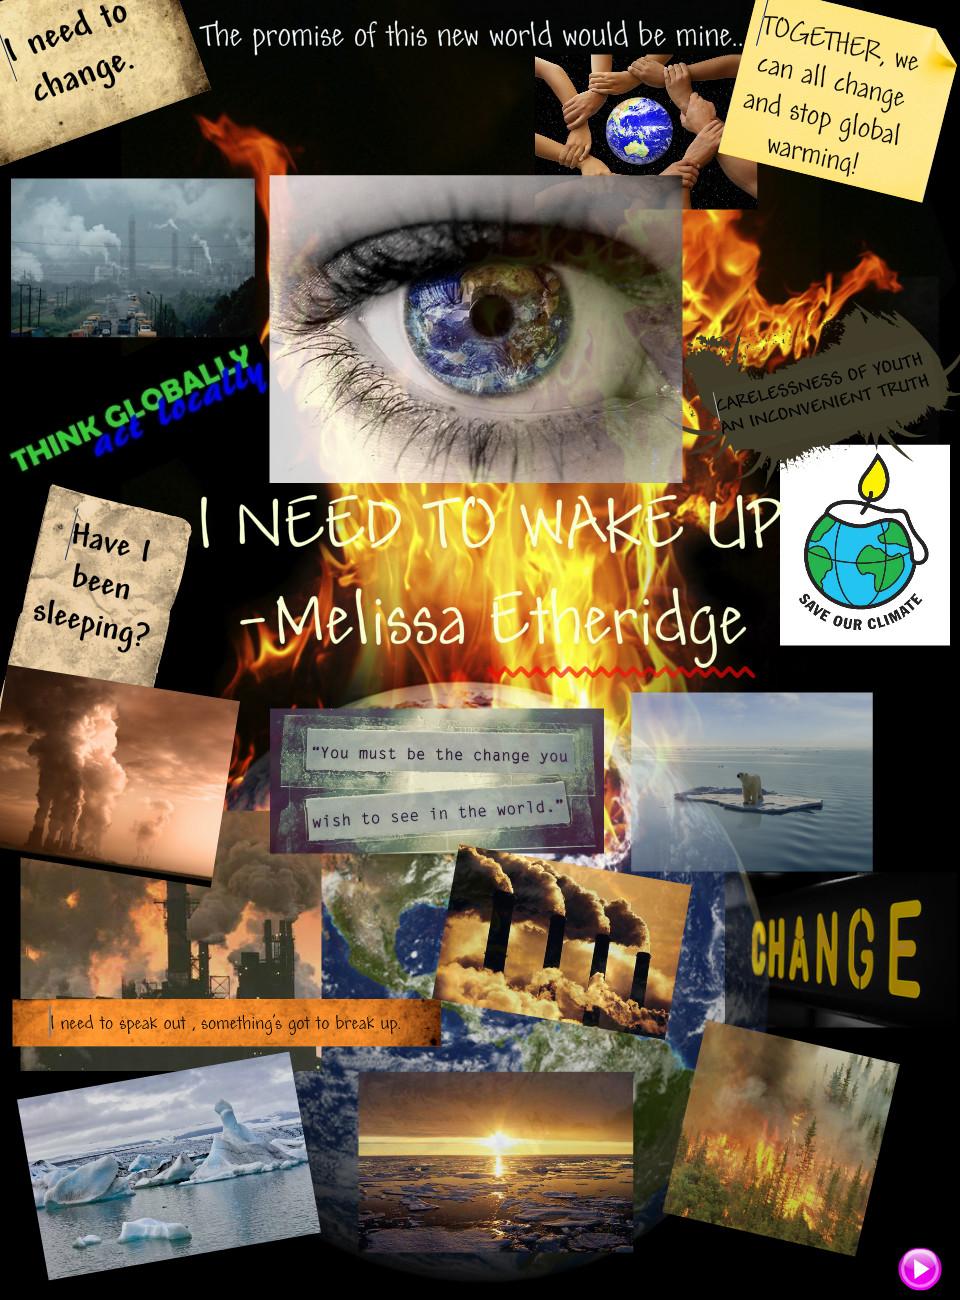 008 Essay Example Visual I Need To Wake Up Melissa Etheridge Verbal Shocking Response Examples Literacy Arts Full